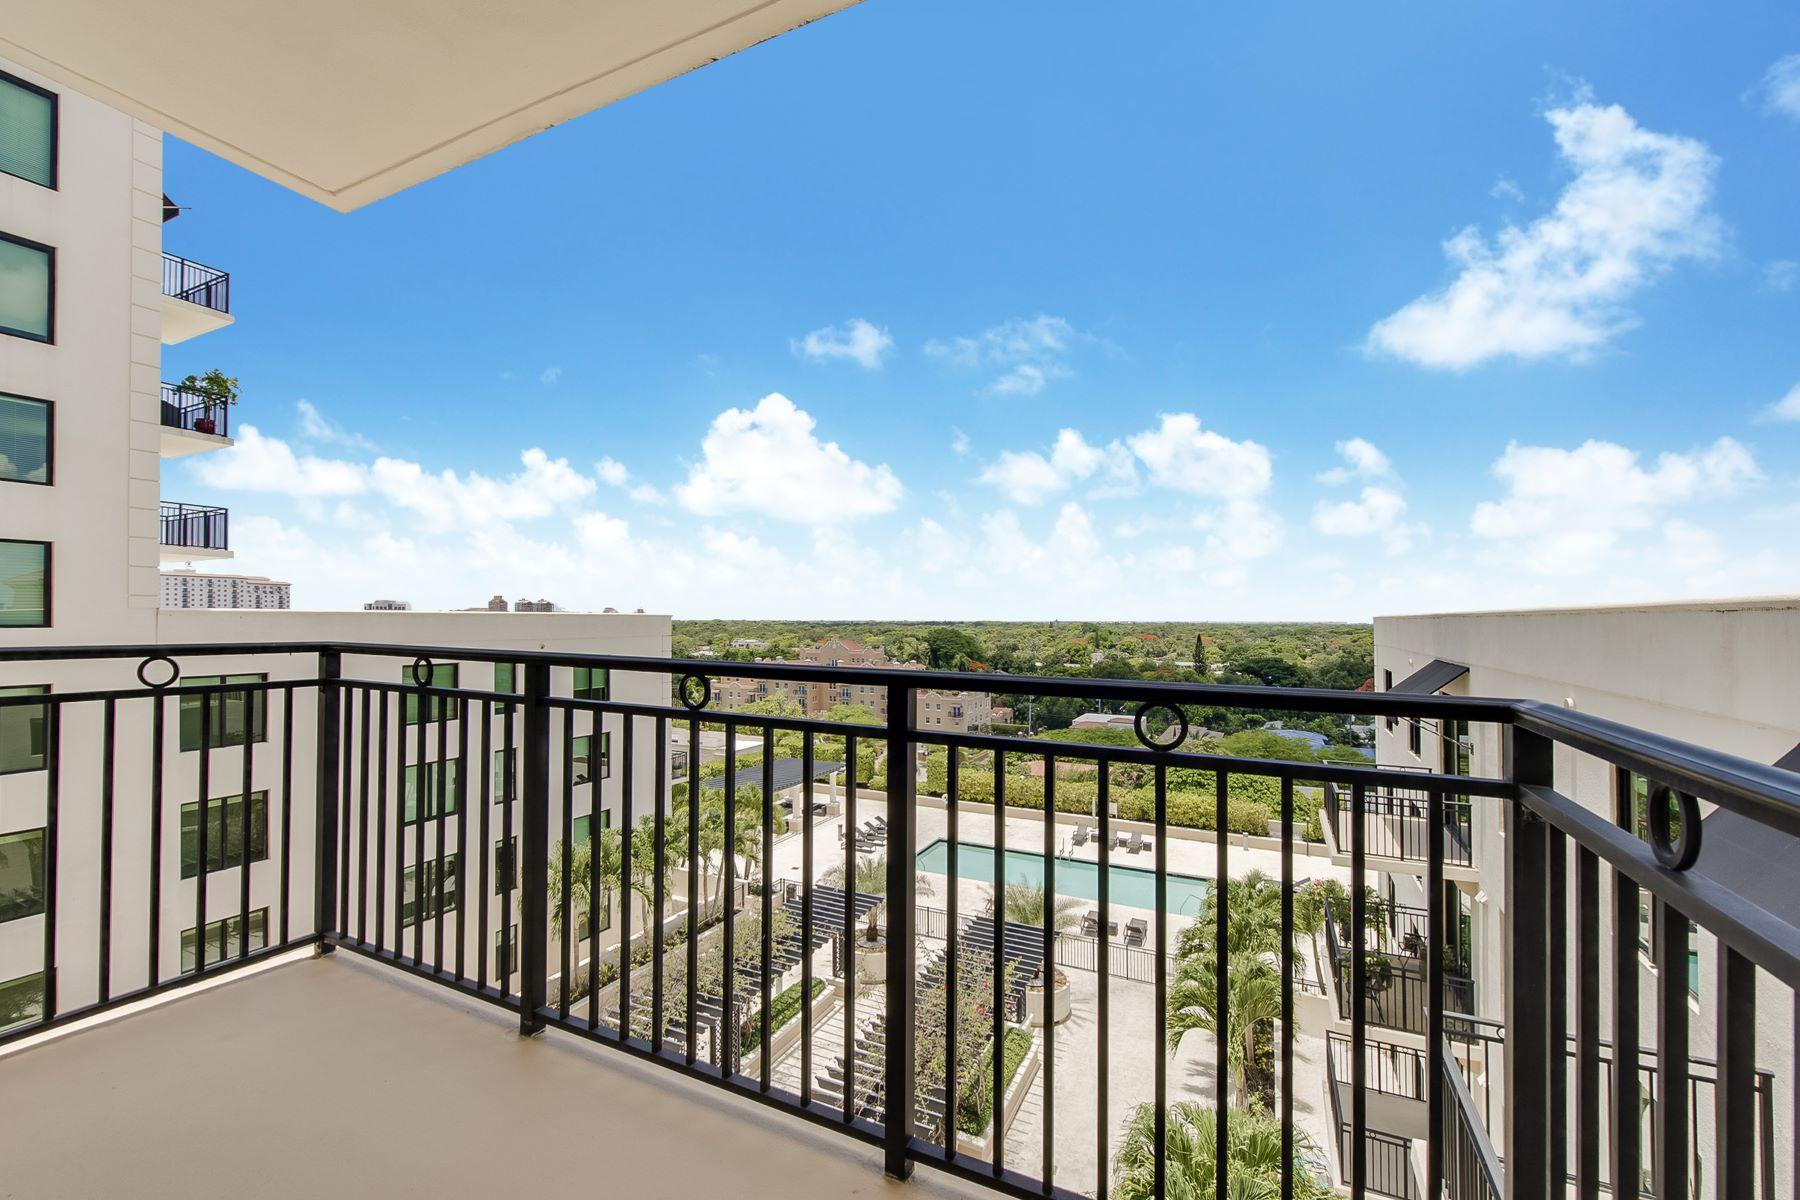 Condominium for Sale at 1300 Ponce De Leon Blvd 1300 Ponce De Leon Blvd 500, Coral Gables, Florida, 33134 United States